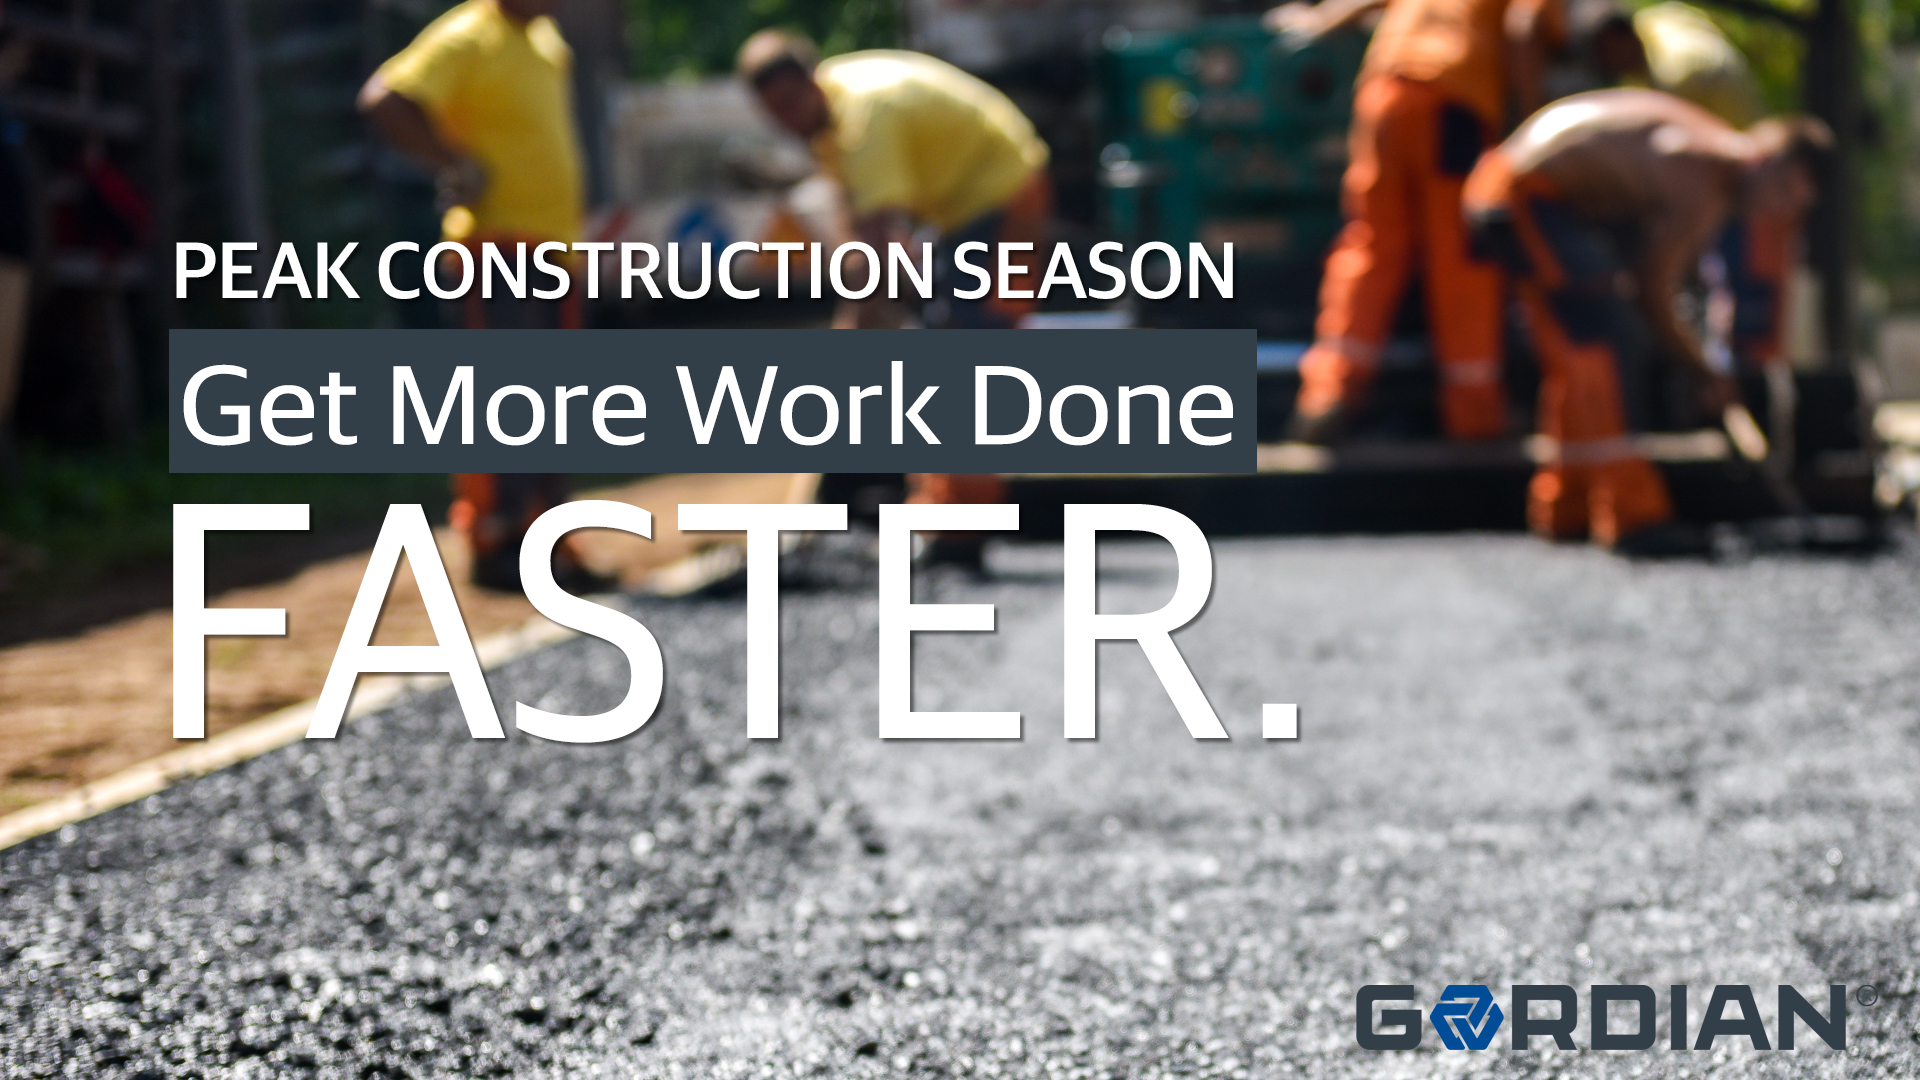 Peak Construction Season: Get More Work Done, Faster